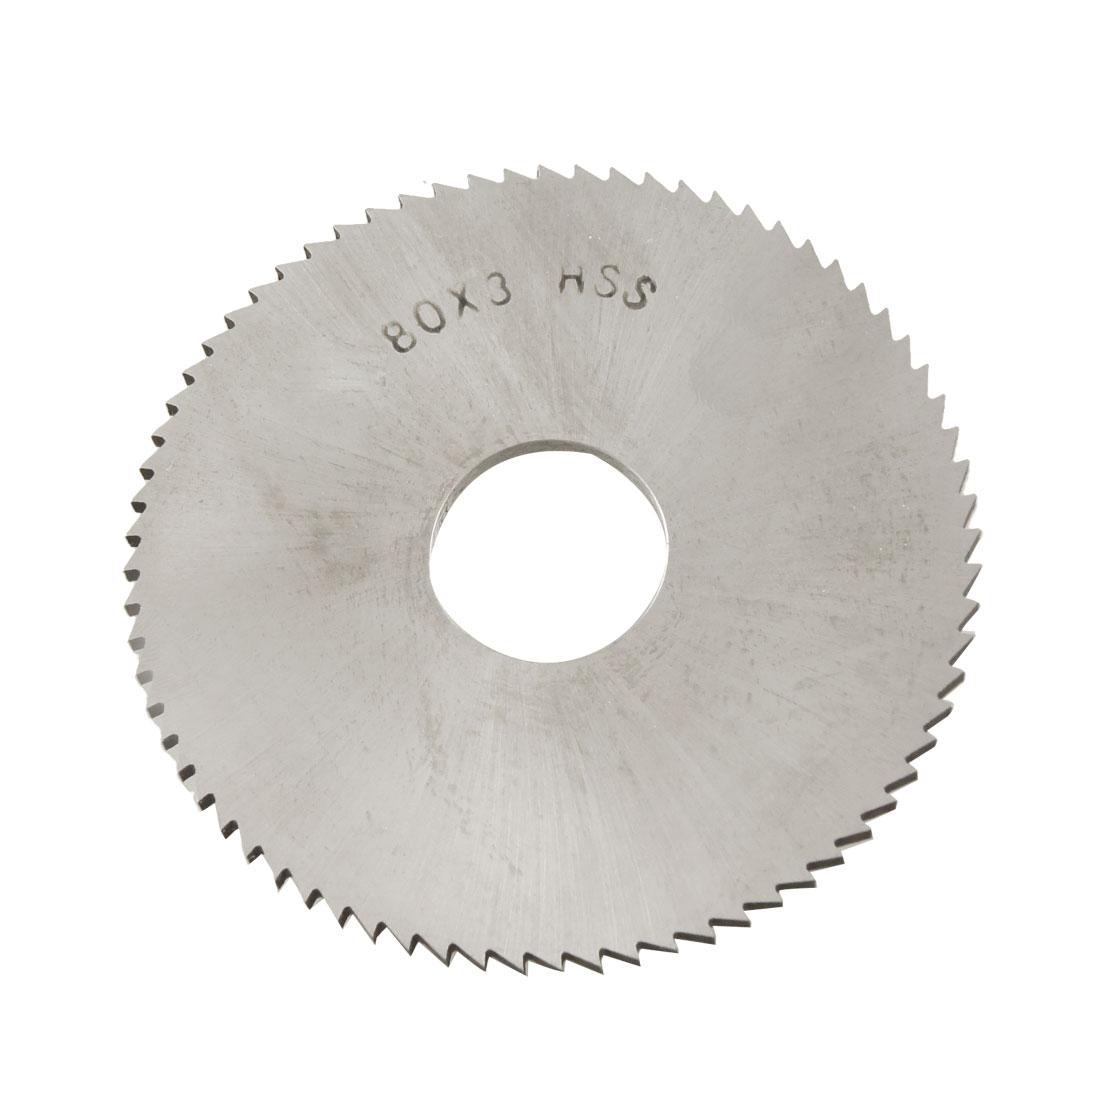 80mm OD 3mm Thickness 72T HSS Milling Cutter Slitting Saw